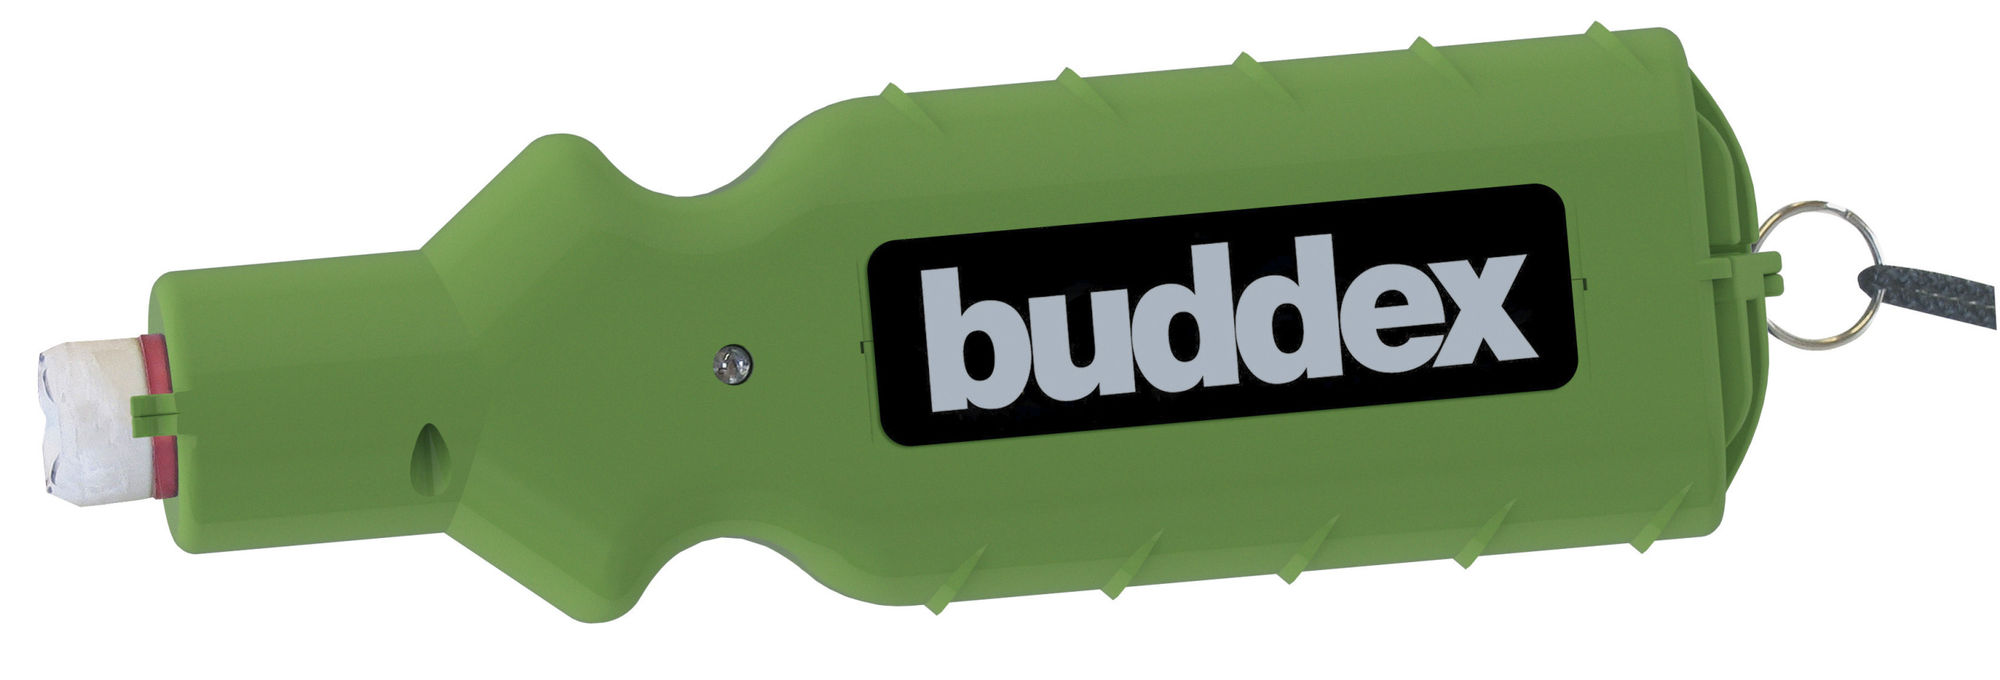 Akku-Enthorner buddex neues Design